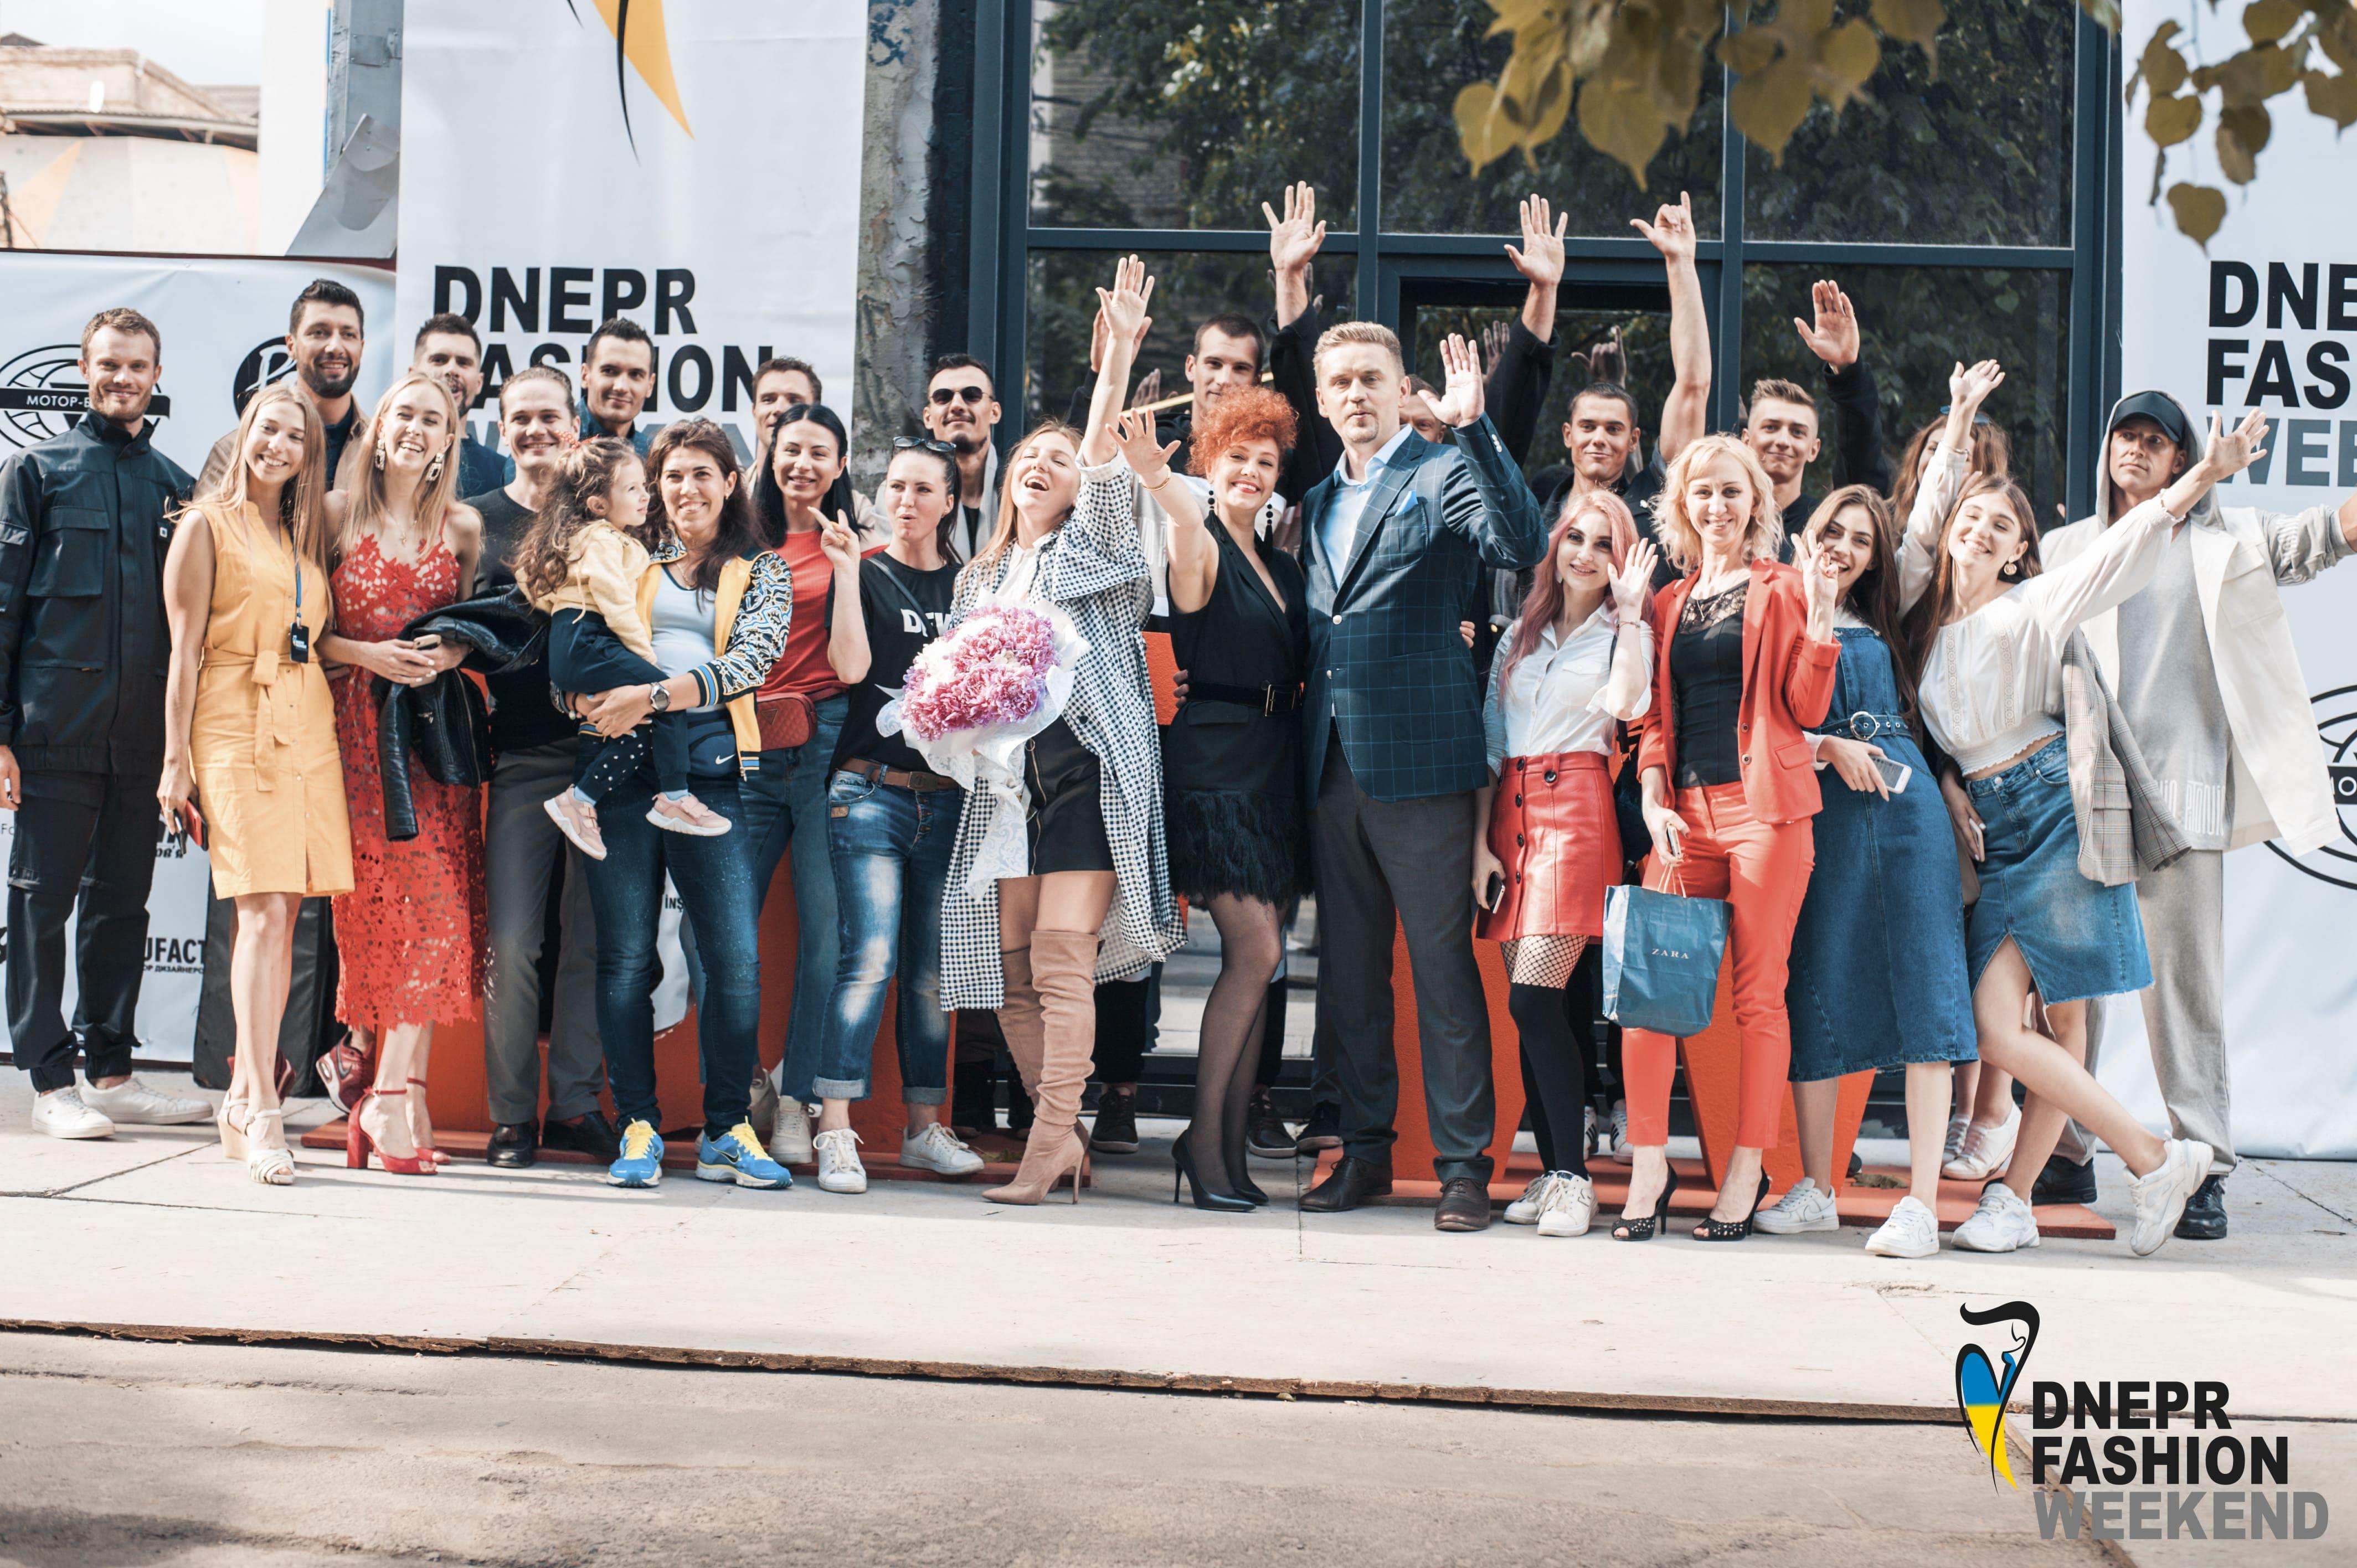 Хроники Dnepr Fashion Weekend как прошли три дня модного мероприятия